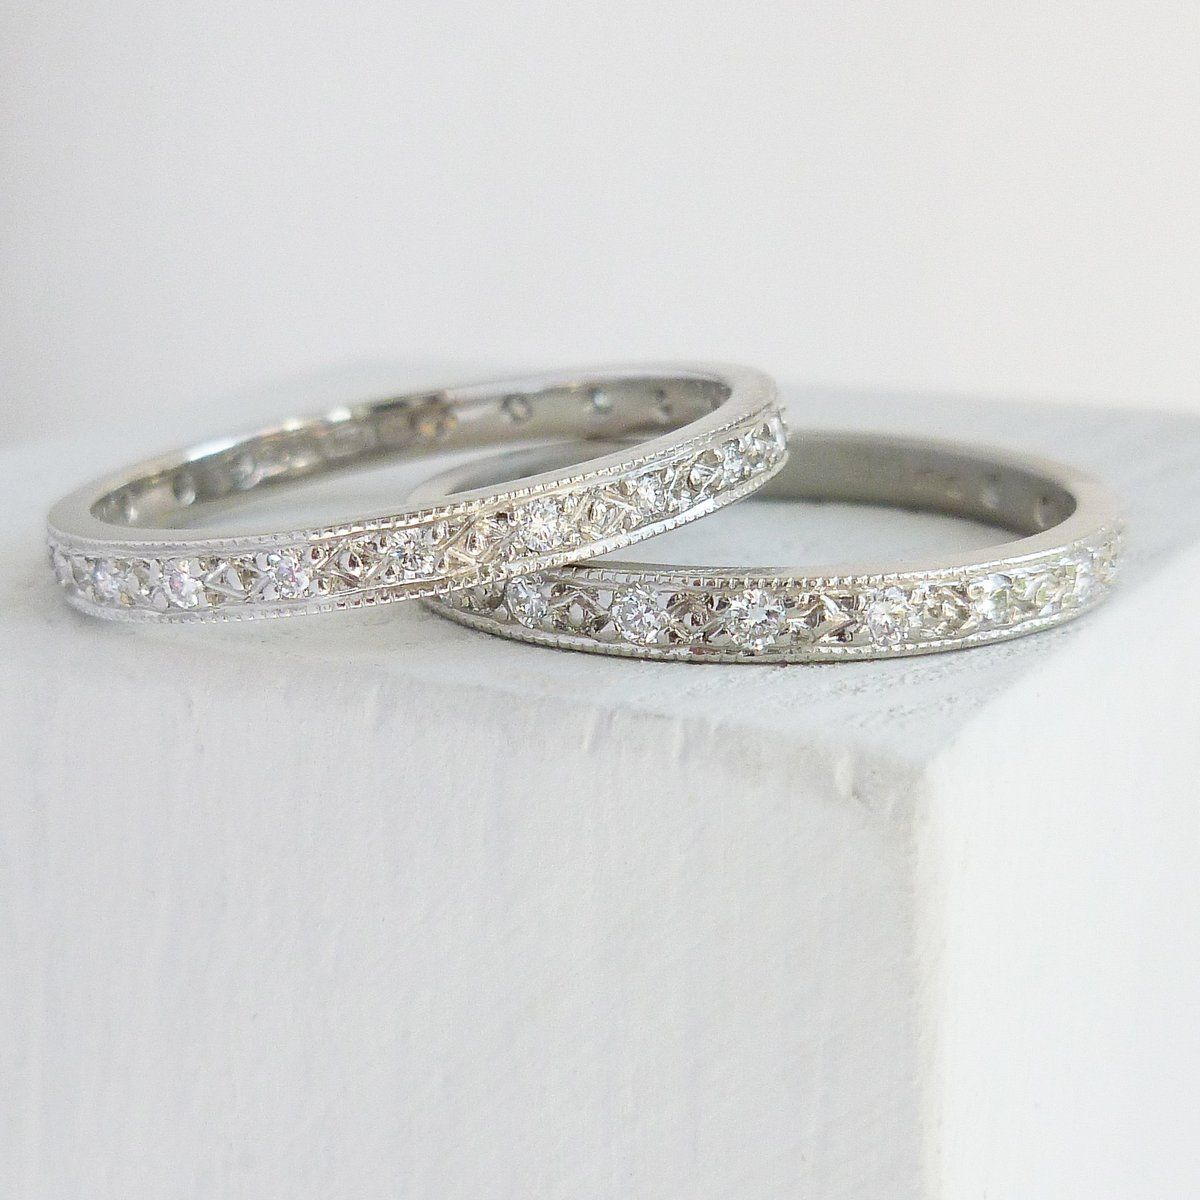 7c953faa5 Beautiful contemporary platinum and diamond wedding or eternity ring - Sue  Lane. #handmade #